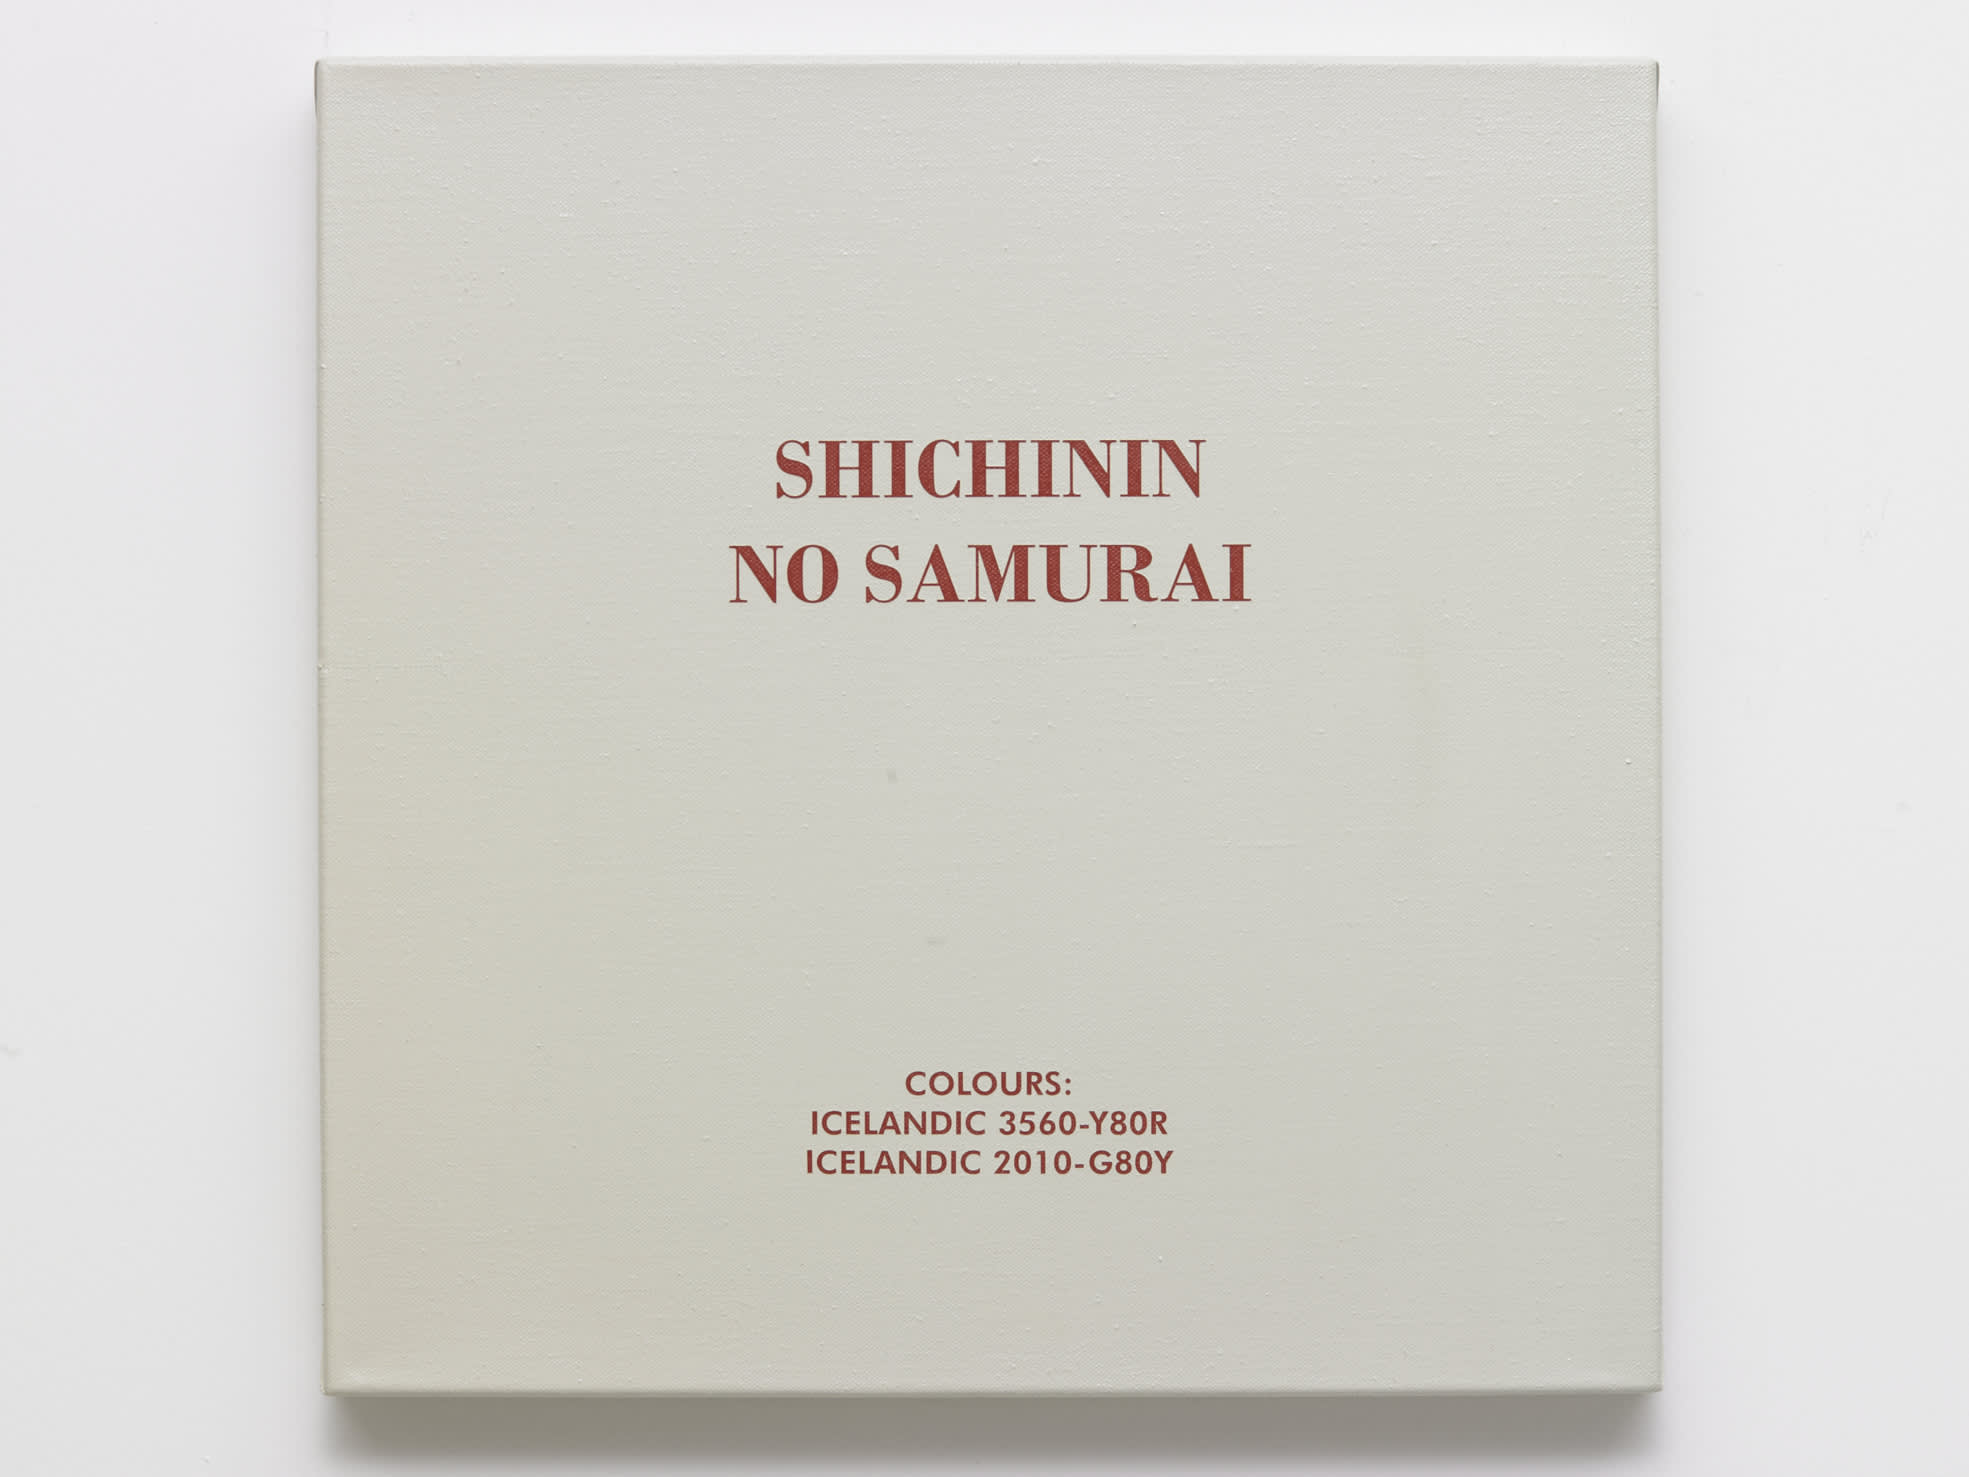 "<span class=""link fancybox-details-link""><a href=""/artists/129-birgir-andresson/works/6120/"">View Detail Page</a></span><div class=""artist""><strong>BIRGIR ANDRÉSSON</strong></div> <div class=""title""><em>Black and White Classics in Icelandic Colours (Shichinin no Samurai)</em>, 2005</div> <div class=""medium"">oil on canvas</div> <div class=""dimensions"">60 x 60 cm<br /> 23 5/8 x 23 5/8 in</div>"